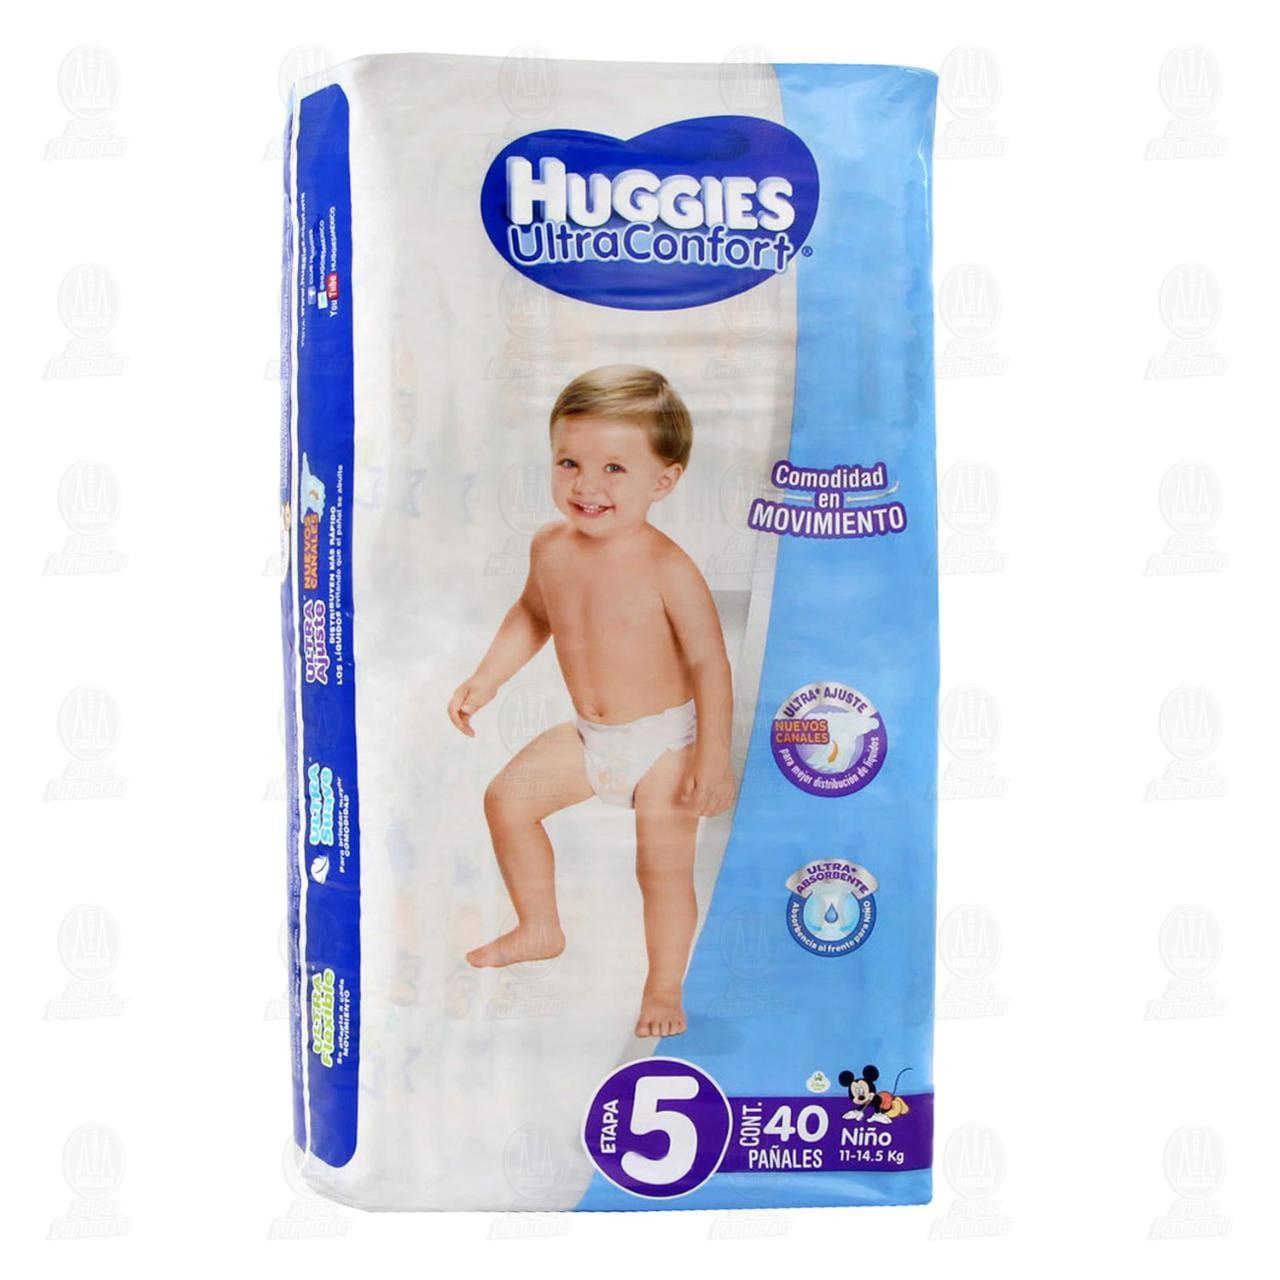 Pañales Huggies UltraConfort para Niño Etapa 5, 40 pzas.